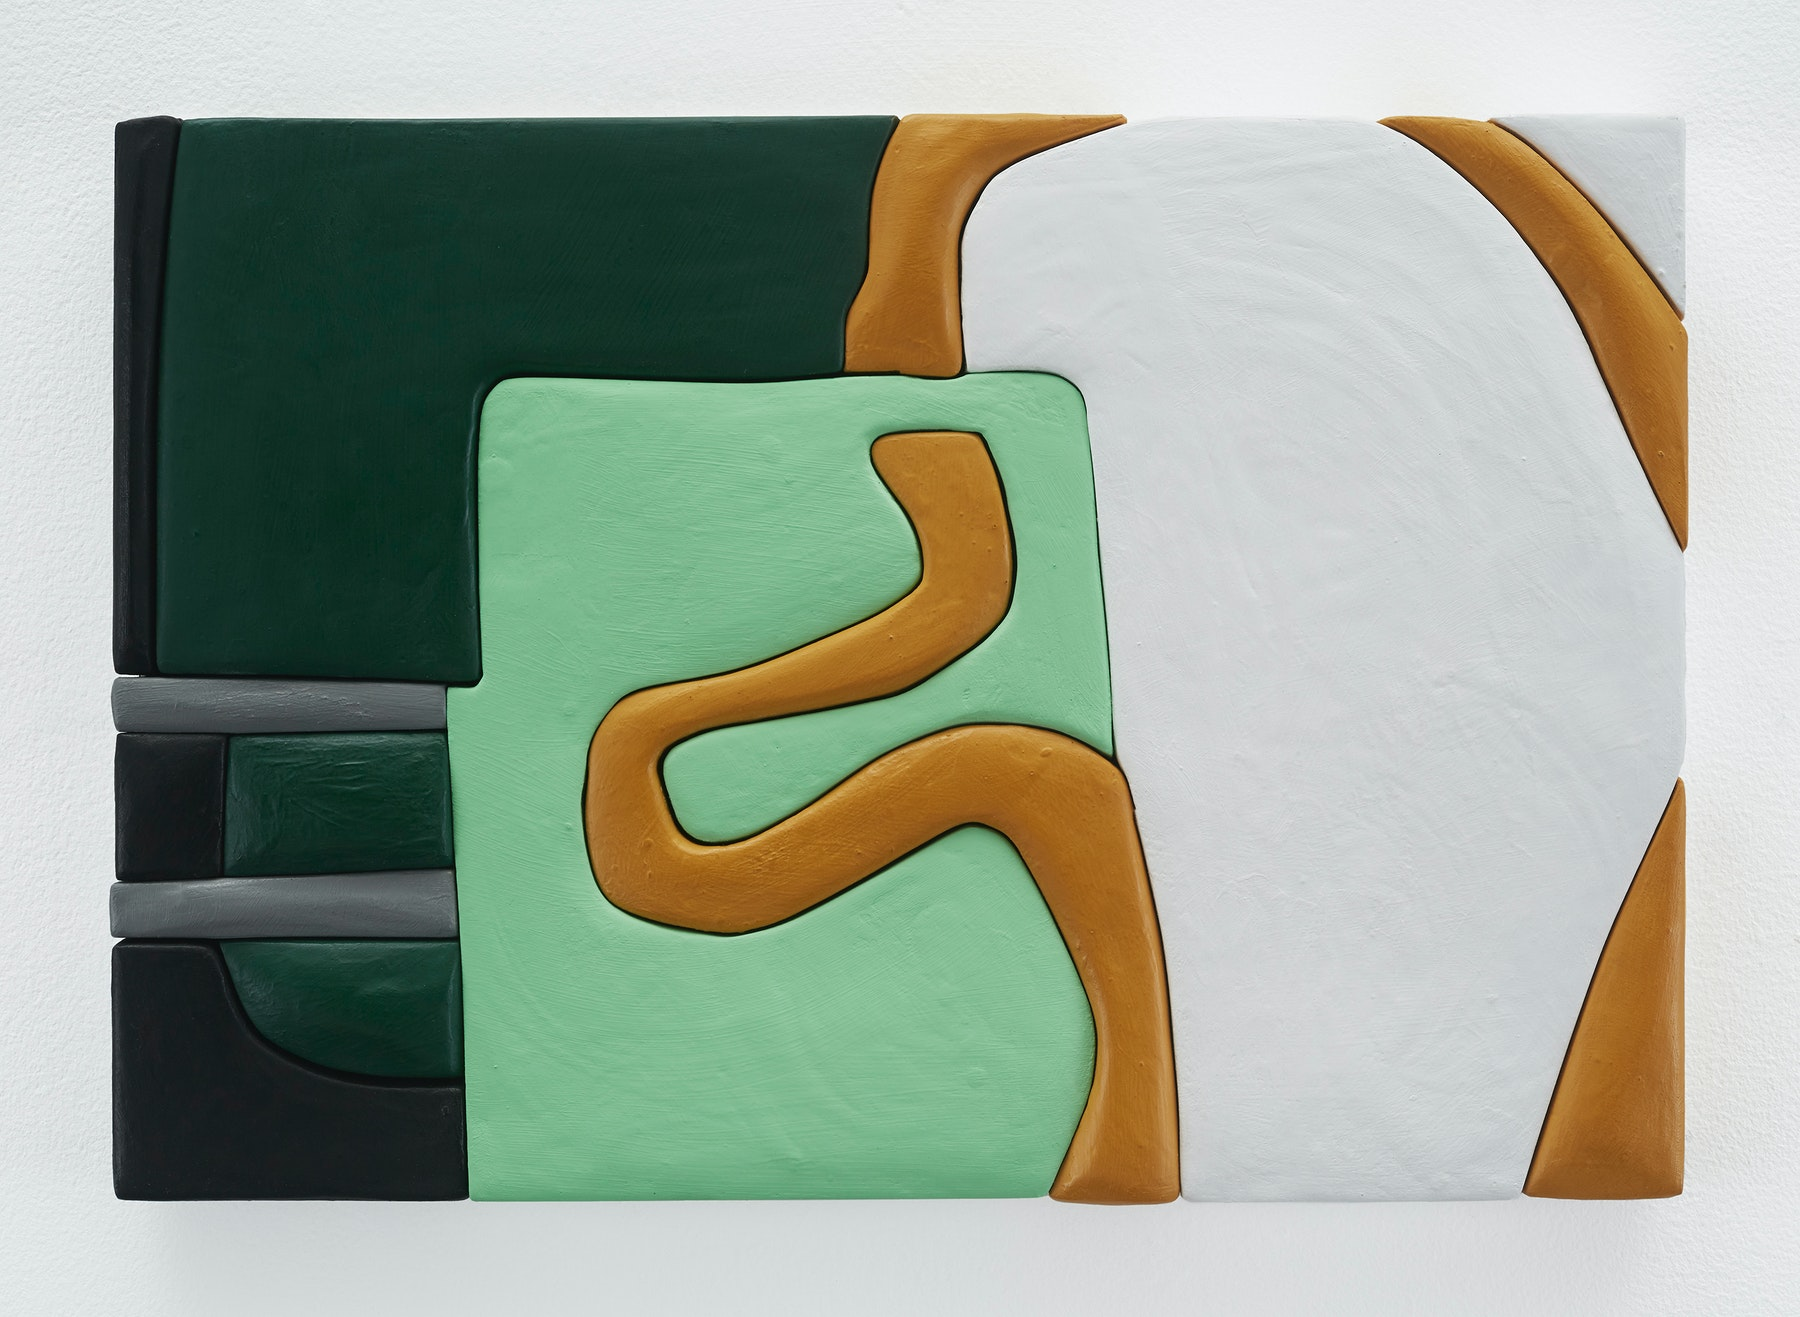 "Sadie Benning ""Untitled 11x16 (TT),"" 2019 Wood, aqua resin, casein, and acrylic gouache 11 x 16"" [HxW] (27.94 x 40.64 cm) Inventory #BEN847 Courtesy of the artist and Vielmetter Los Angeles Photocredit: Chris Austin"